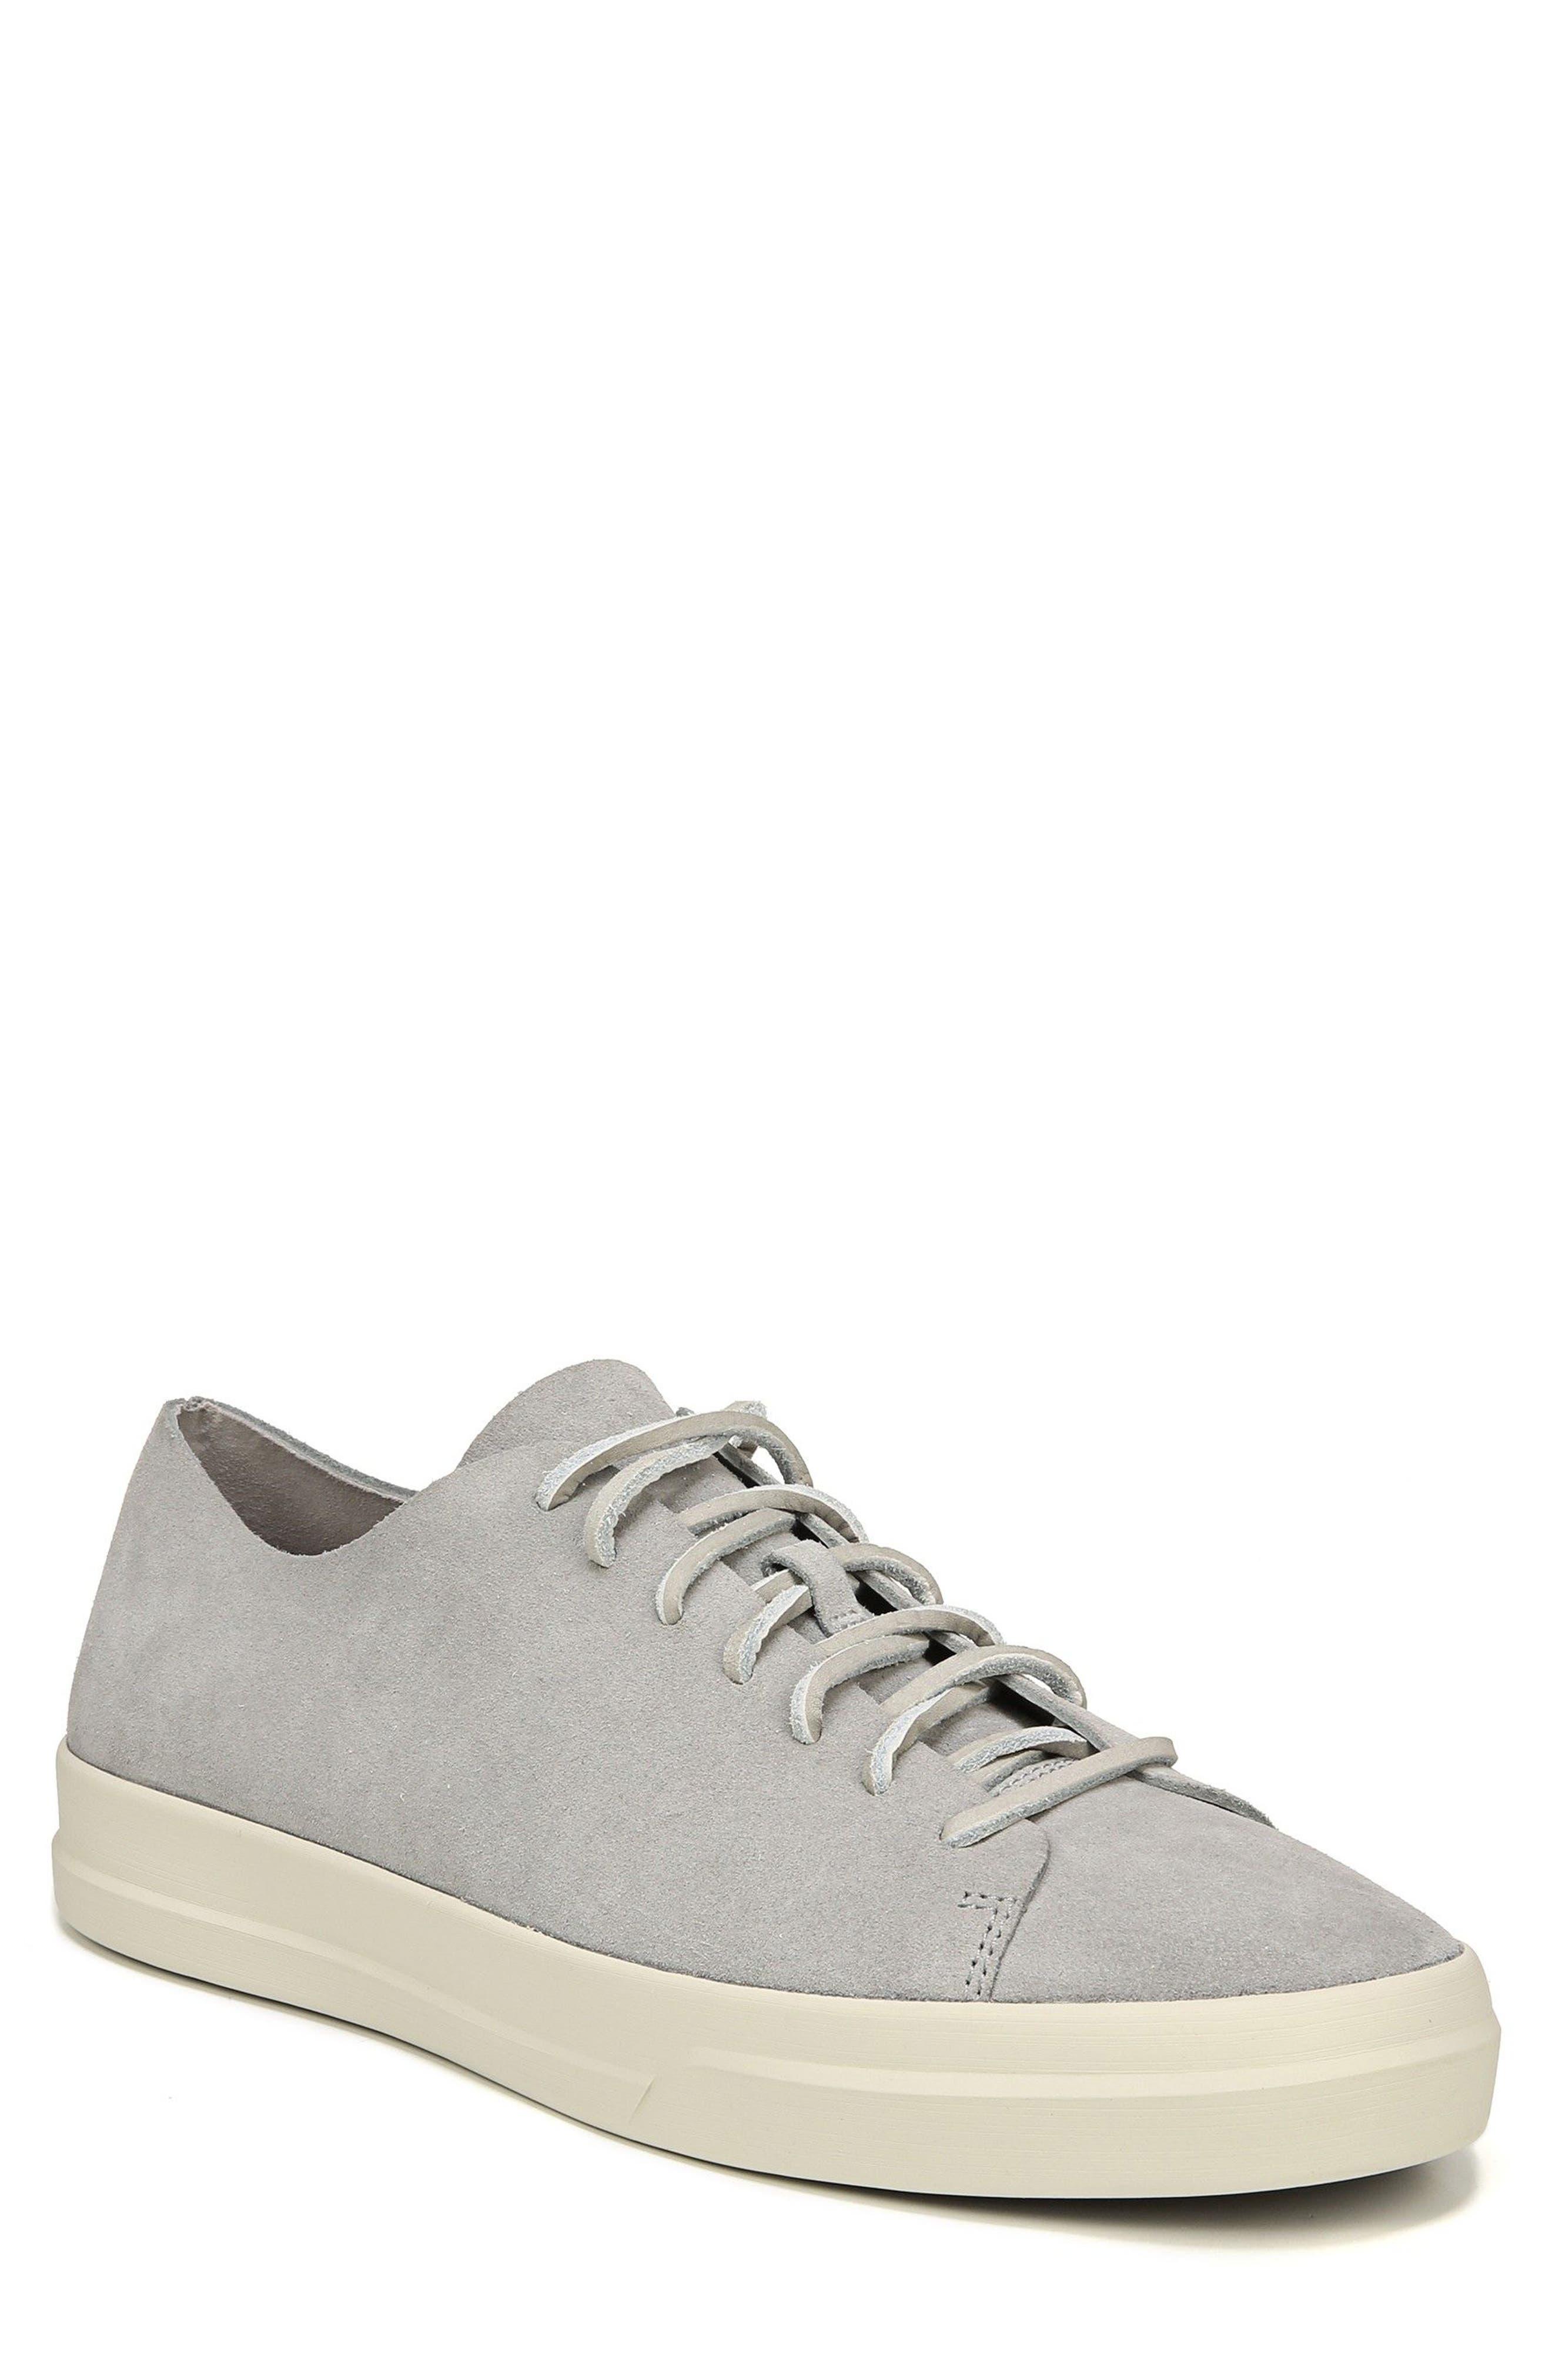 Copeland Sneaker,                             Main thumbnail 1, color,                             022